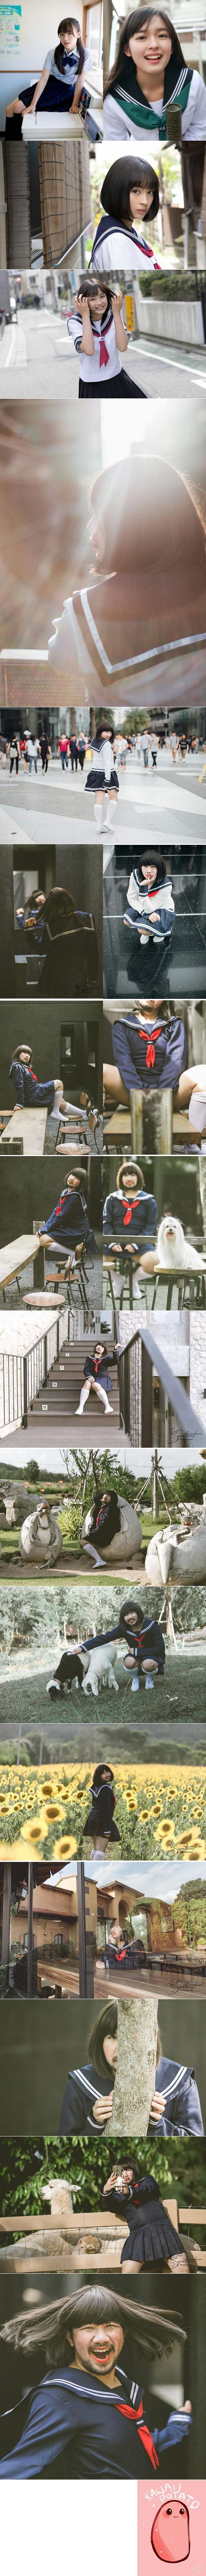 How to create Kawaii Japanese style photos like those in YA movies do